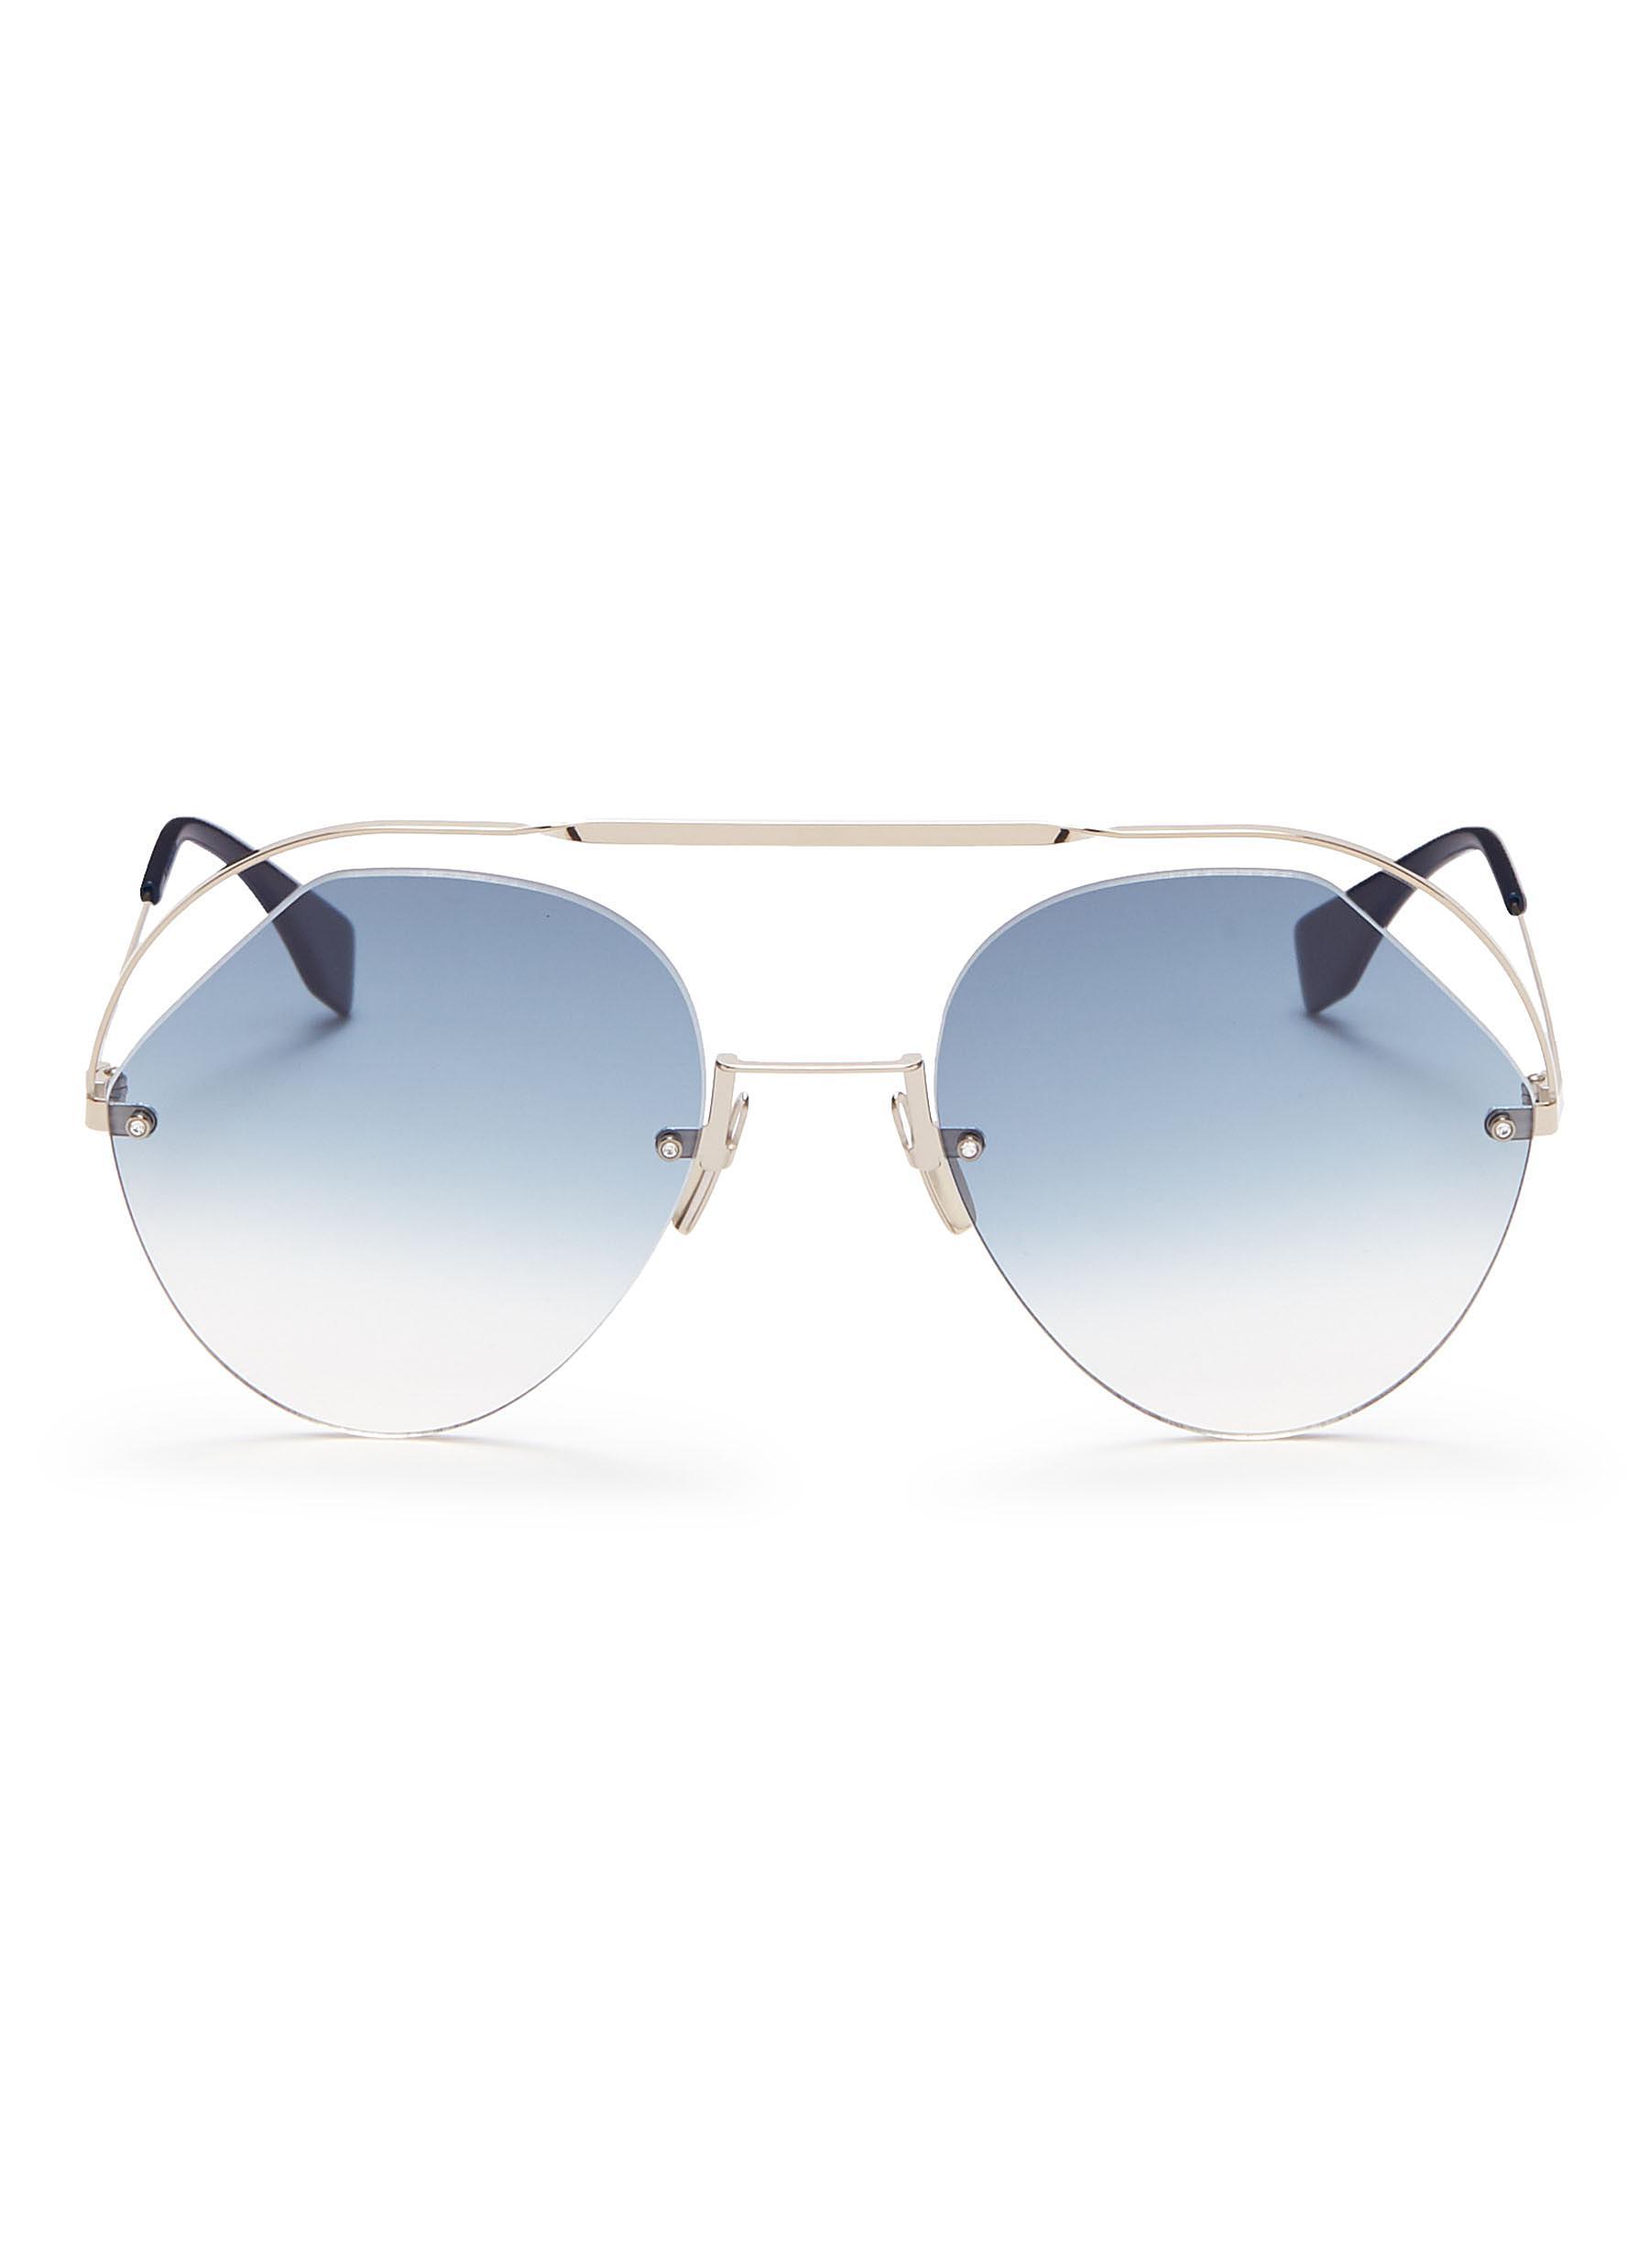 354ca52210 Fendi. Metal browbar rimless angular aviator sunglasses